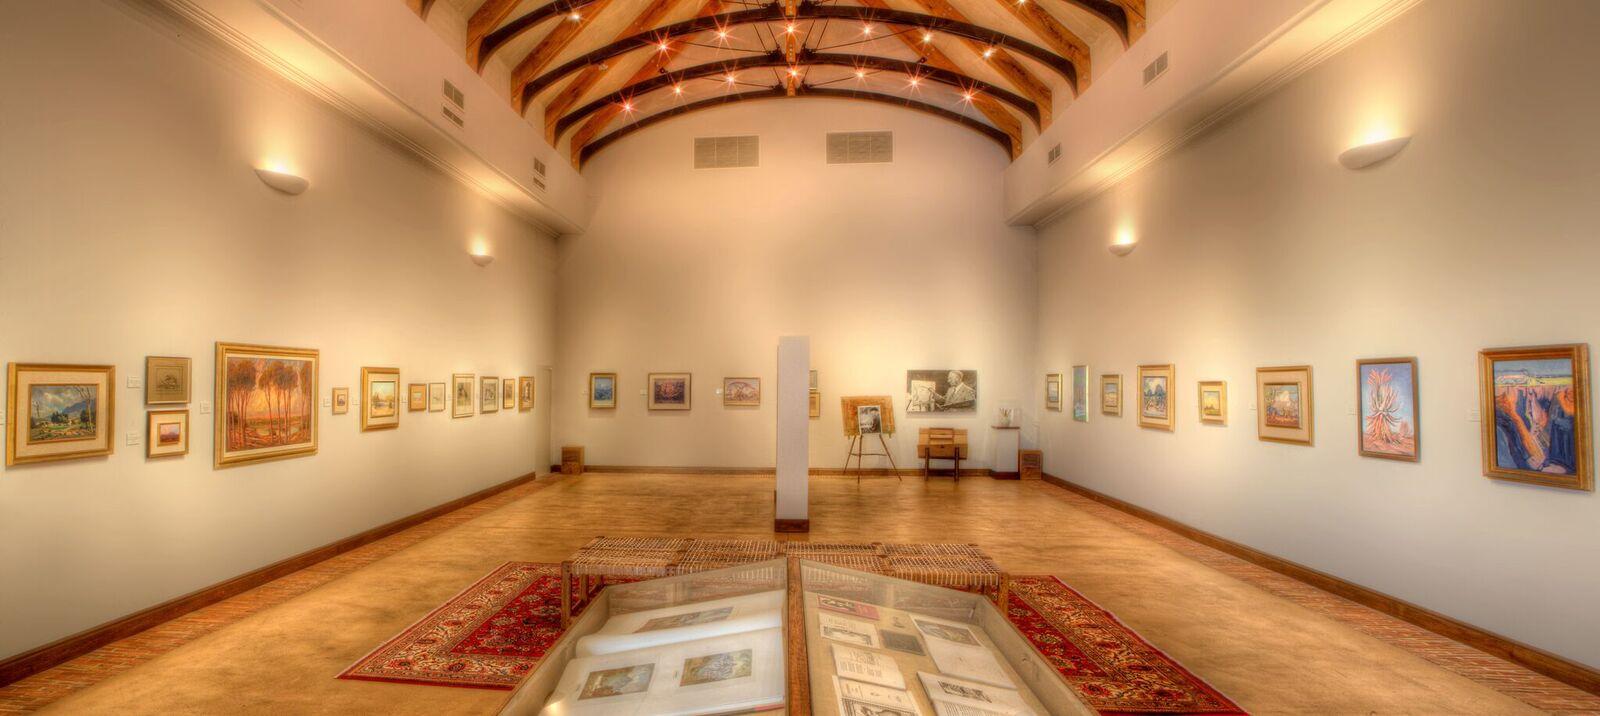 La Motte Museum Pierneef exhibition